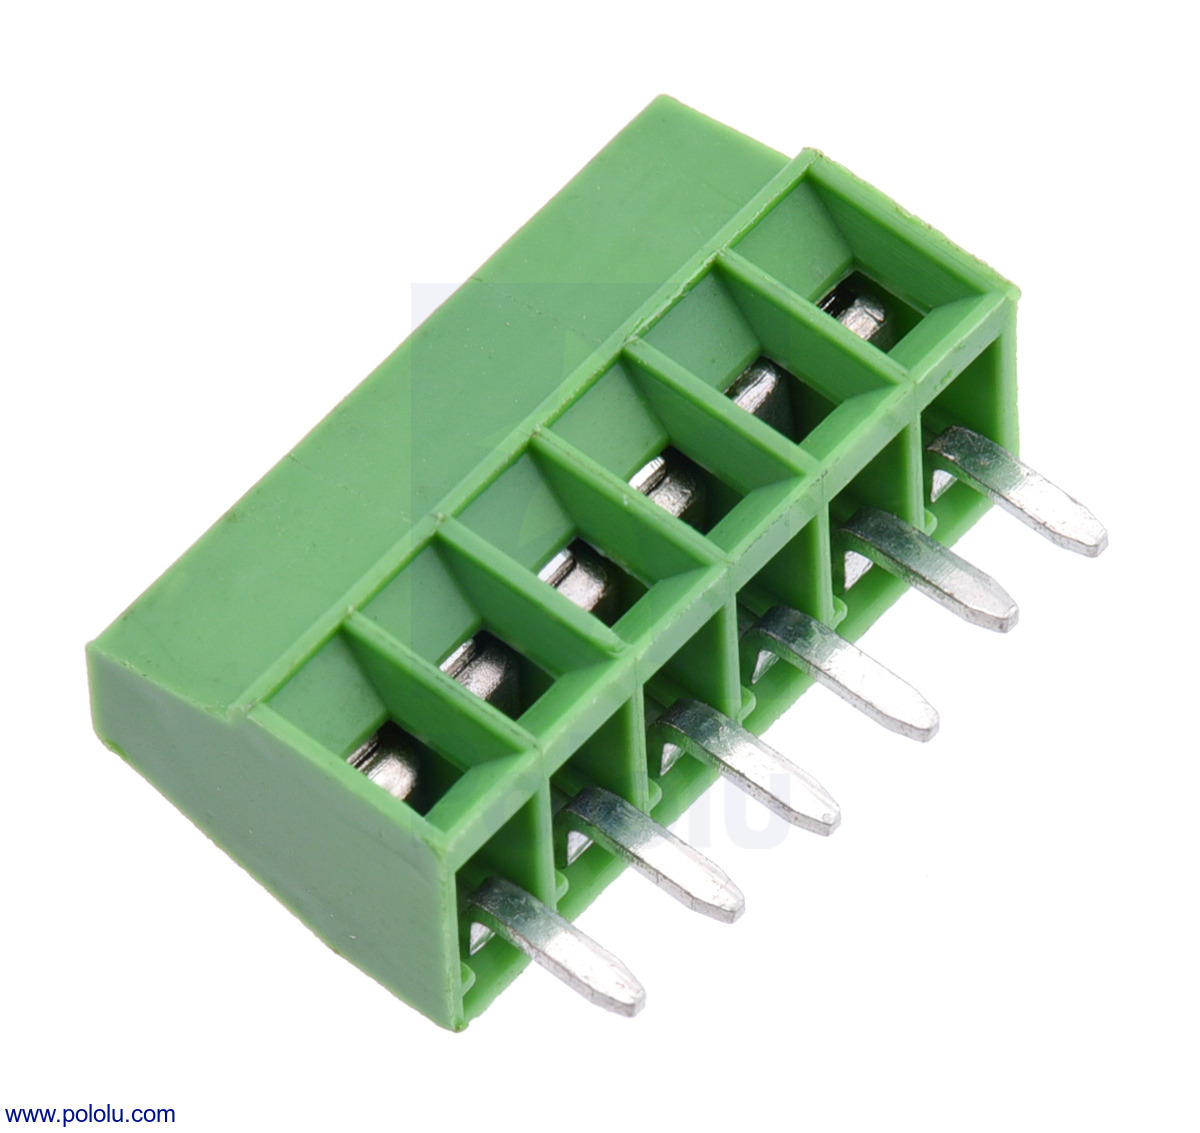 terminalblock 6 pins